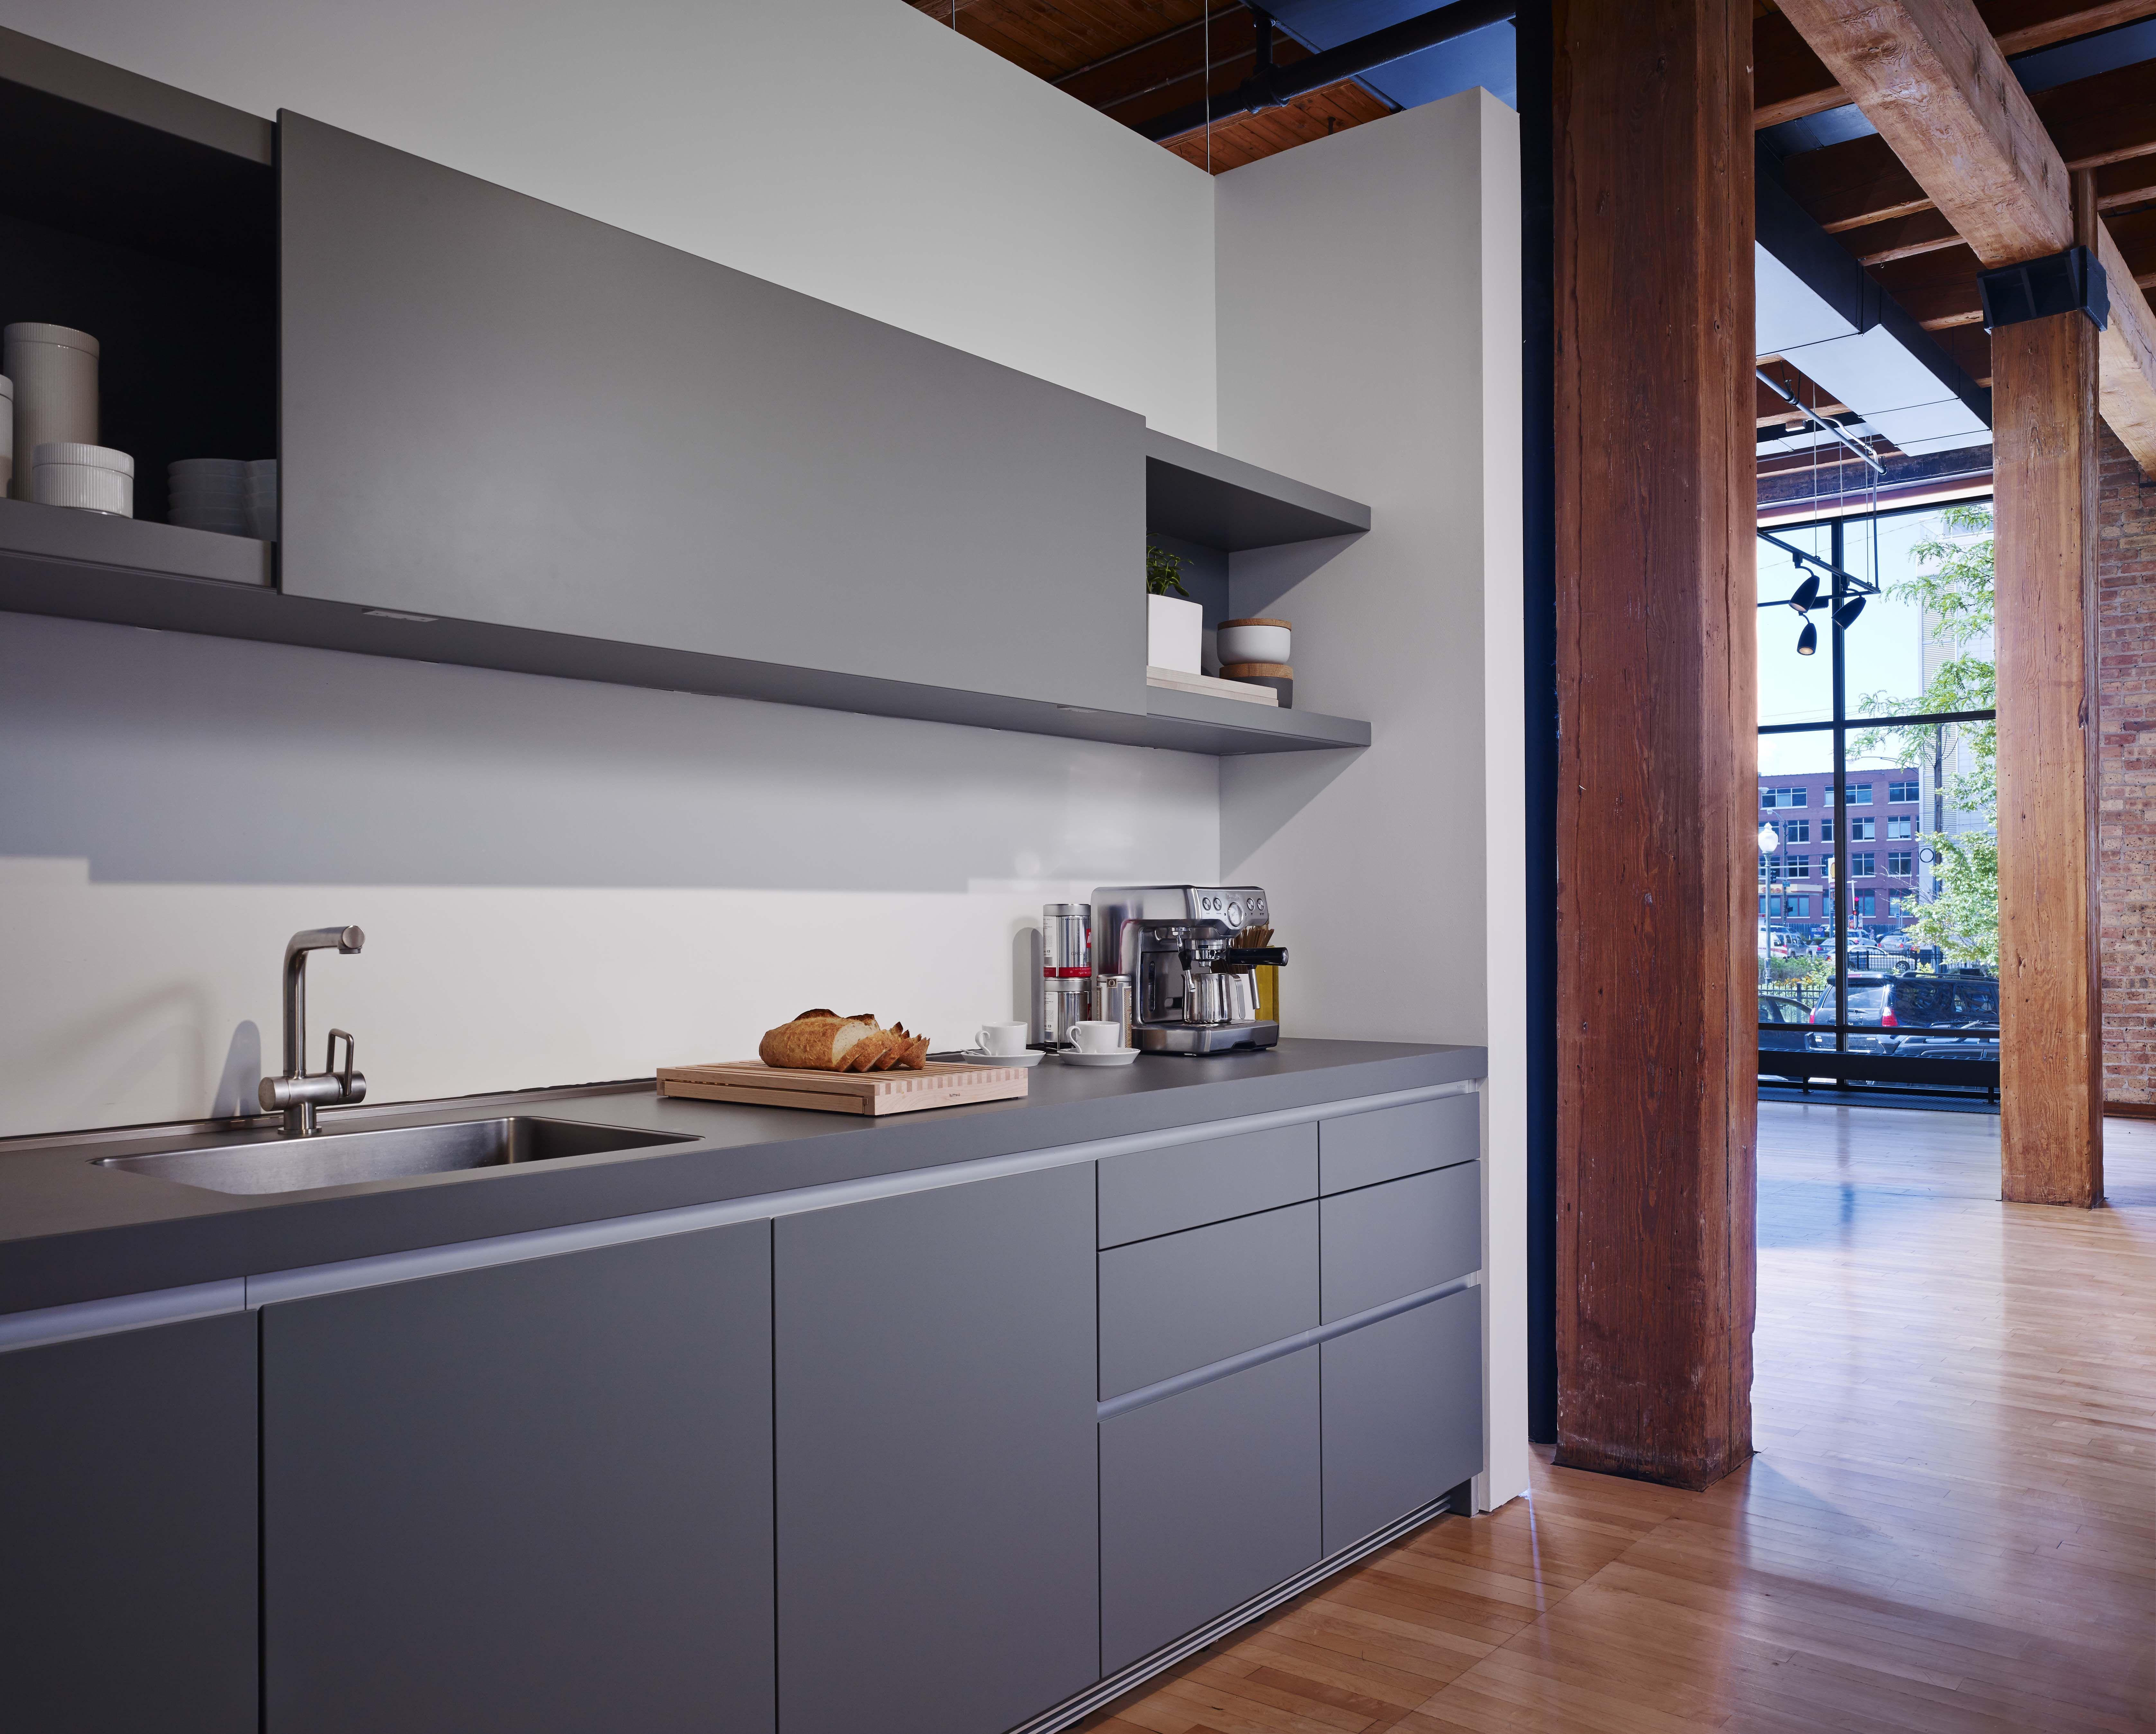 Atemberaubend Küche Umbau Long Island Ny Galerie - Ideen Für Die ...